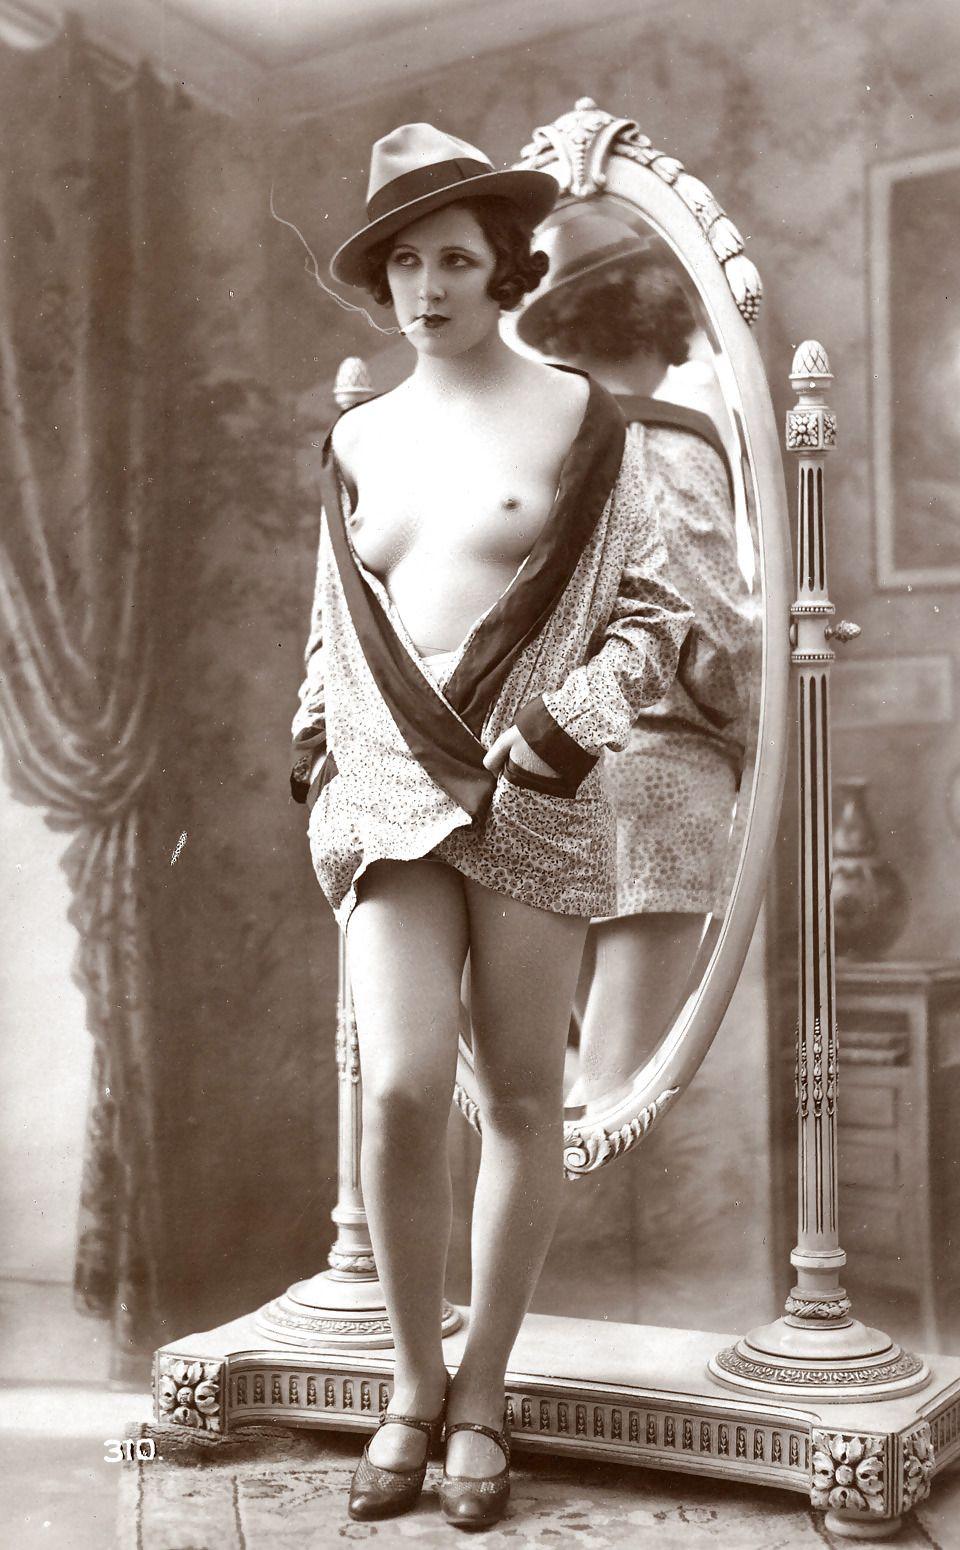 ogromnie-siski-erotika-retro-vintazh-porno-filmi-pro